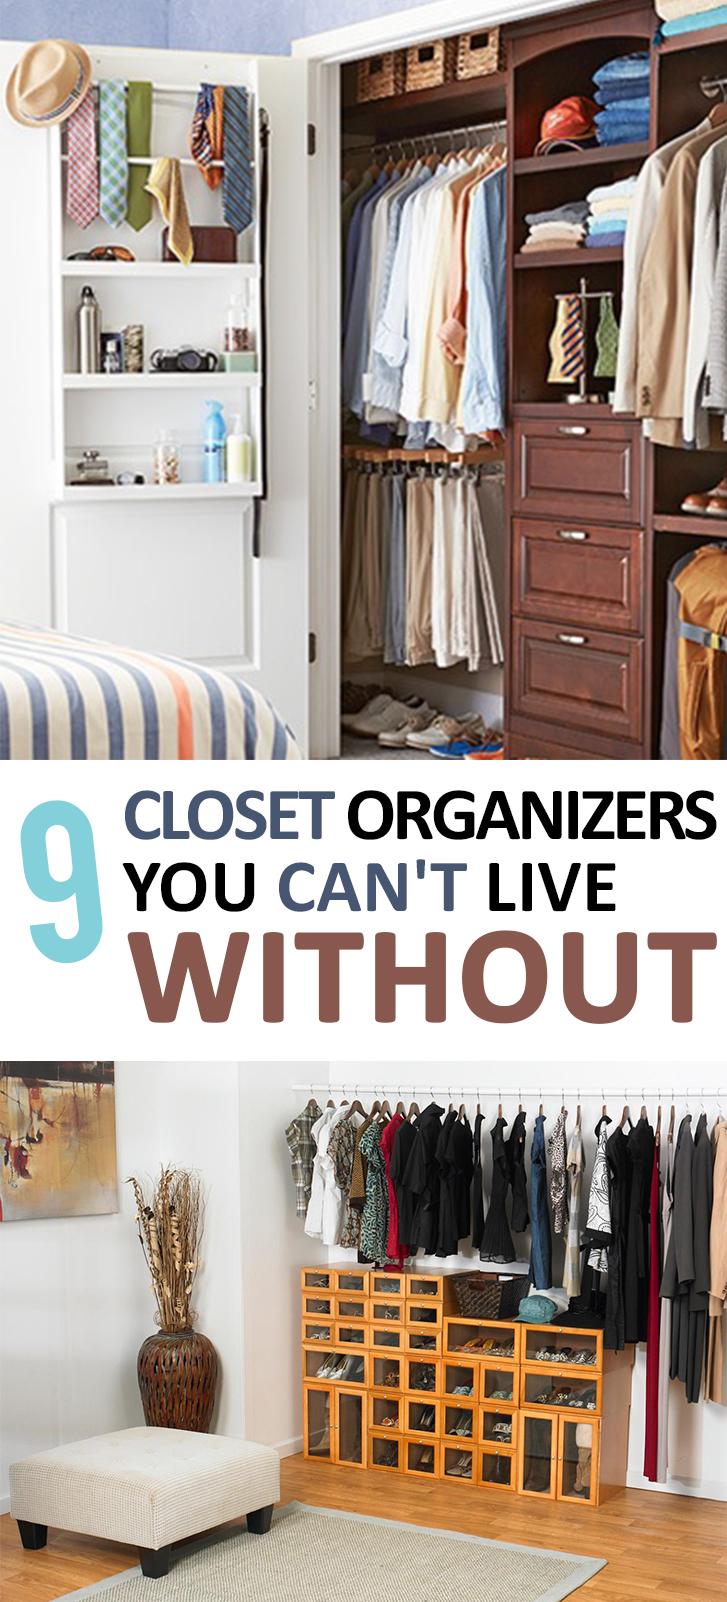 Closet Organization, Organization Tips and Tricks, Organization 101, Home Organization. Closet, Organization, DIY Home, Organization.